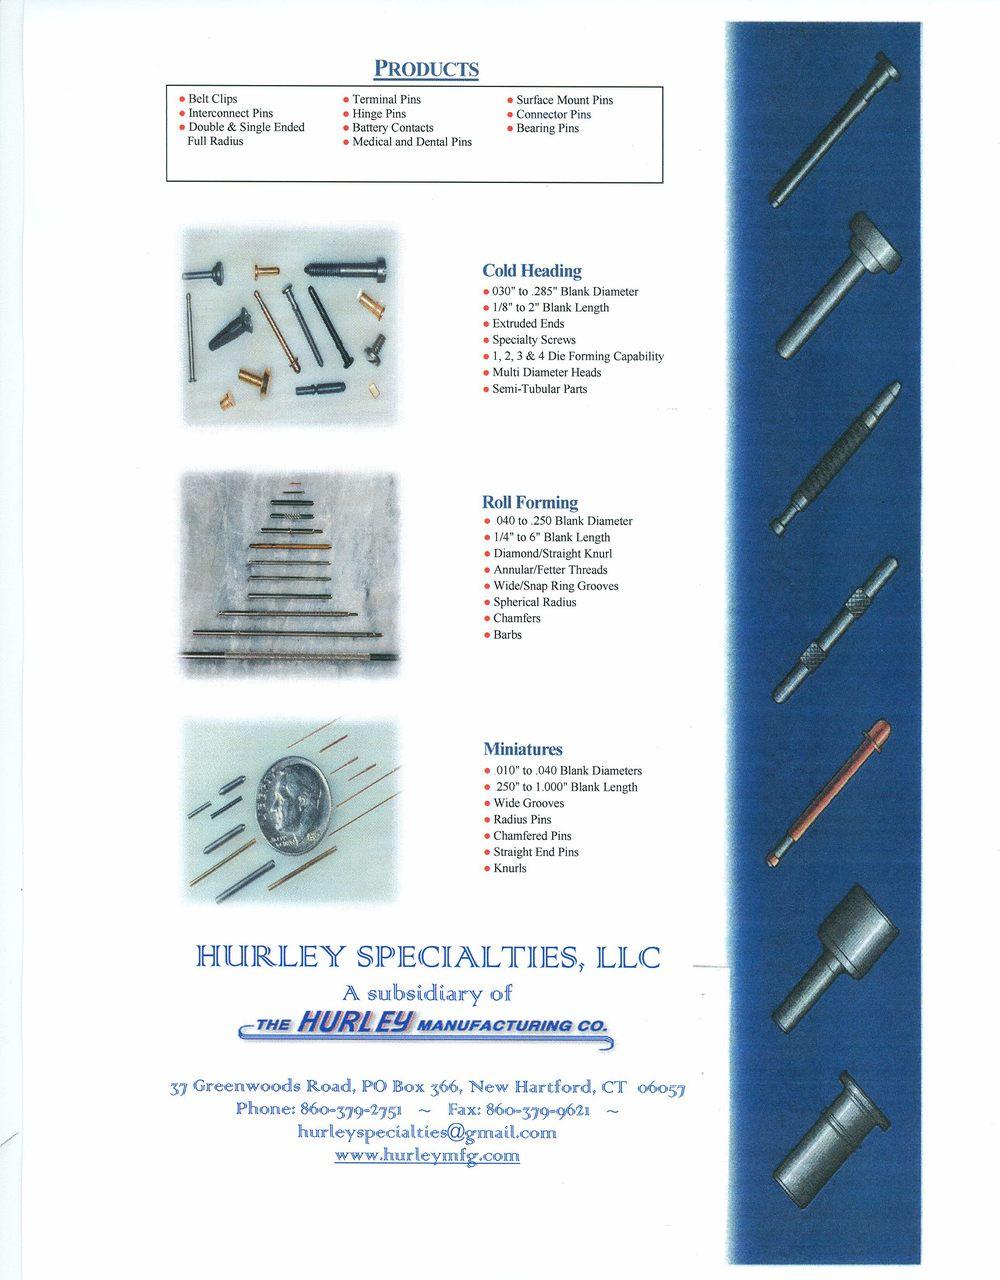 Hurley Specialties Flyer_Page_2.jpg